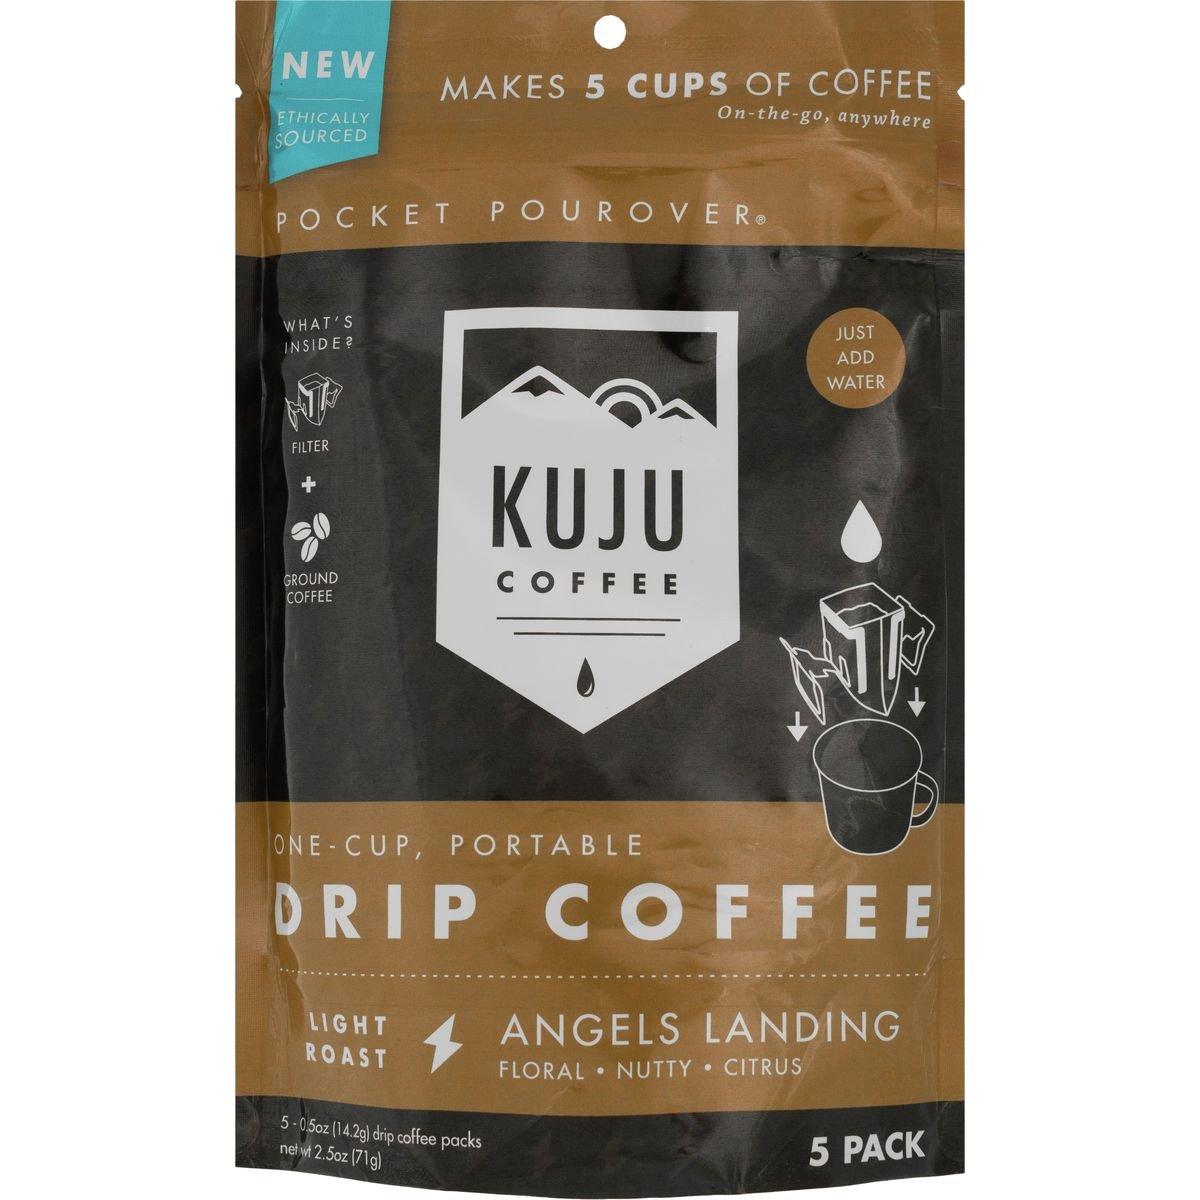 KujuコーヒーkujuコーヒーポケットPouroverコーヒー – 5 - Pack B0752MPL5K  Angels Landing (Light Roast) One Size